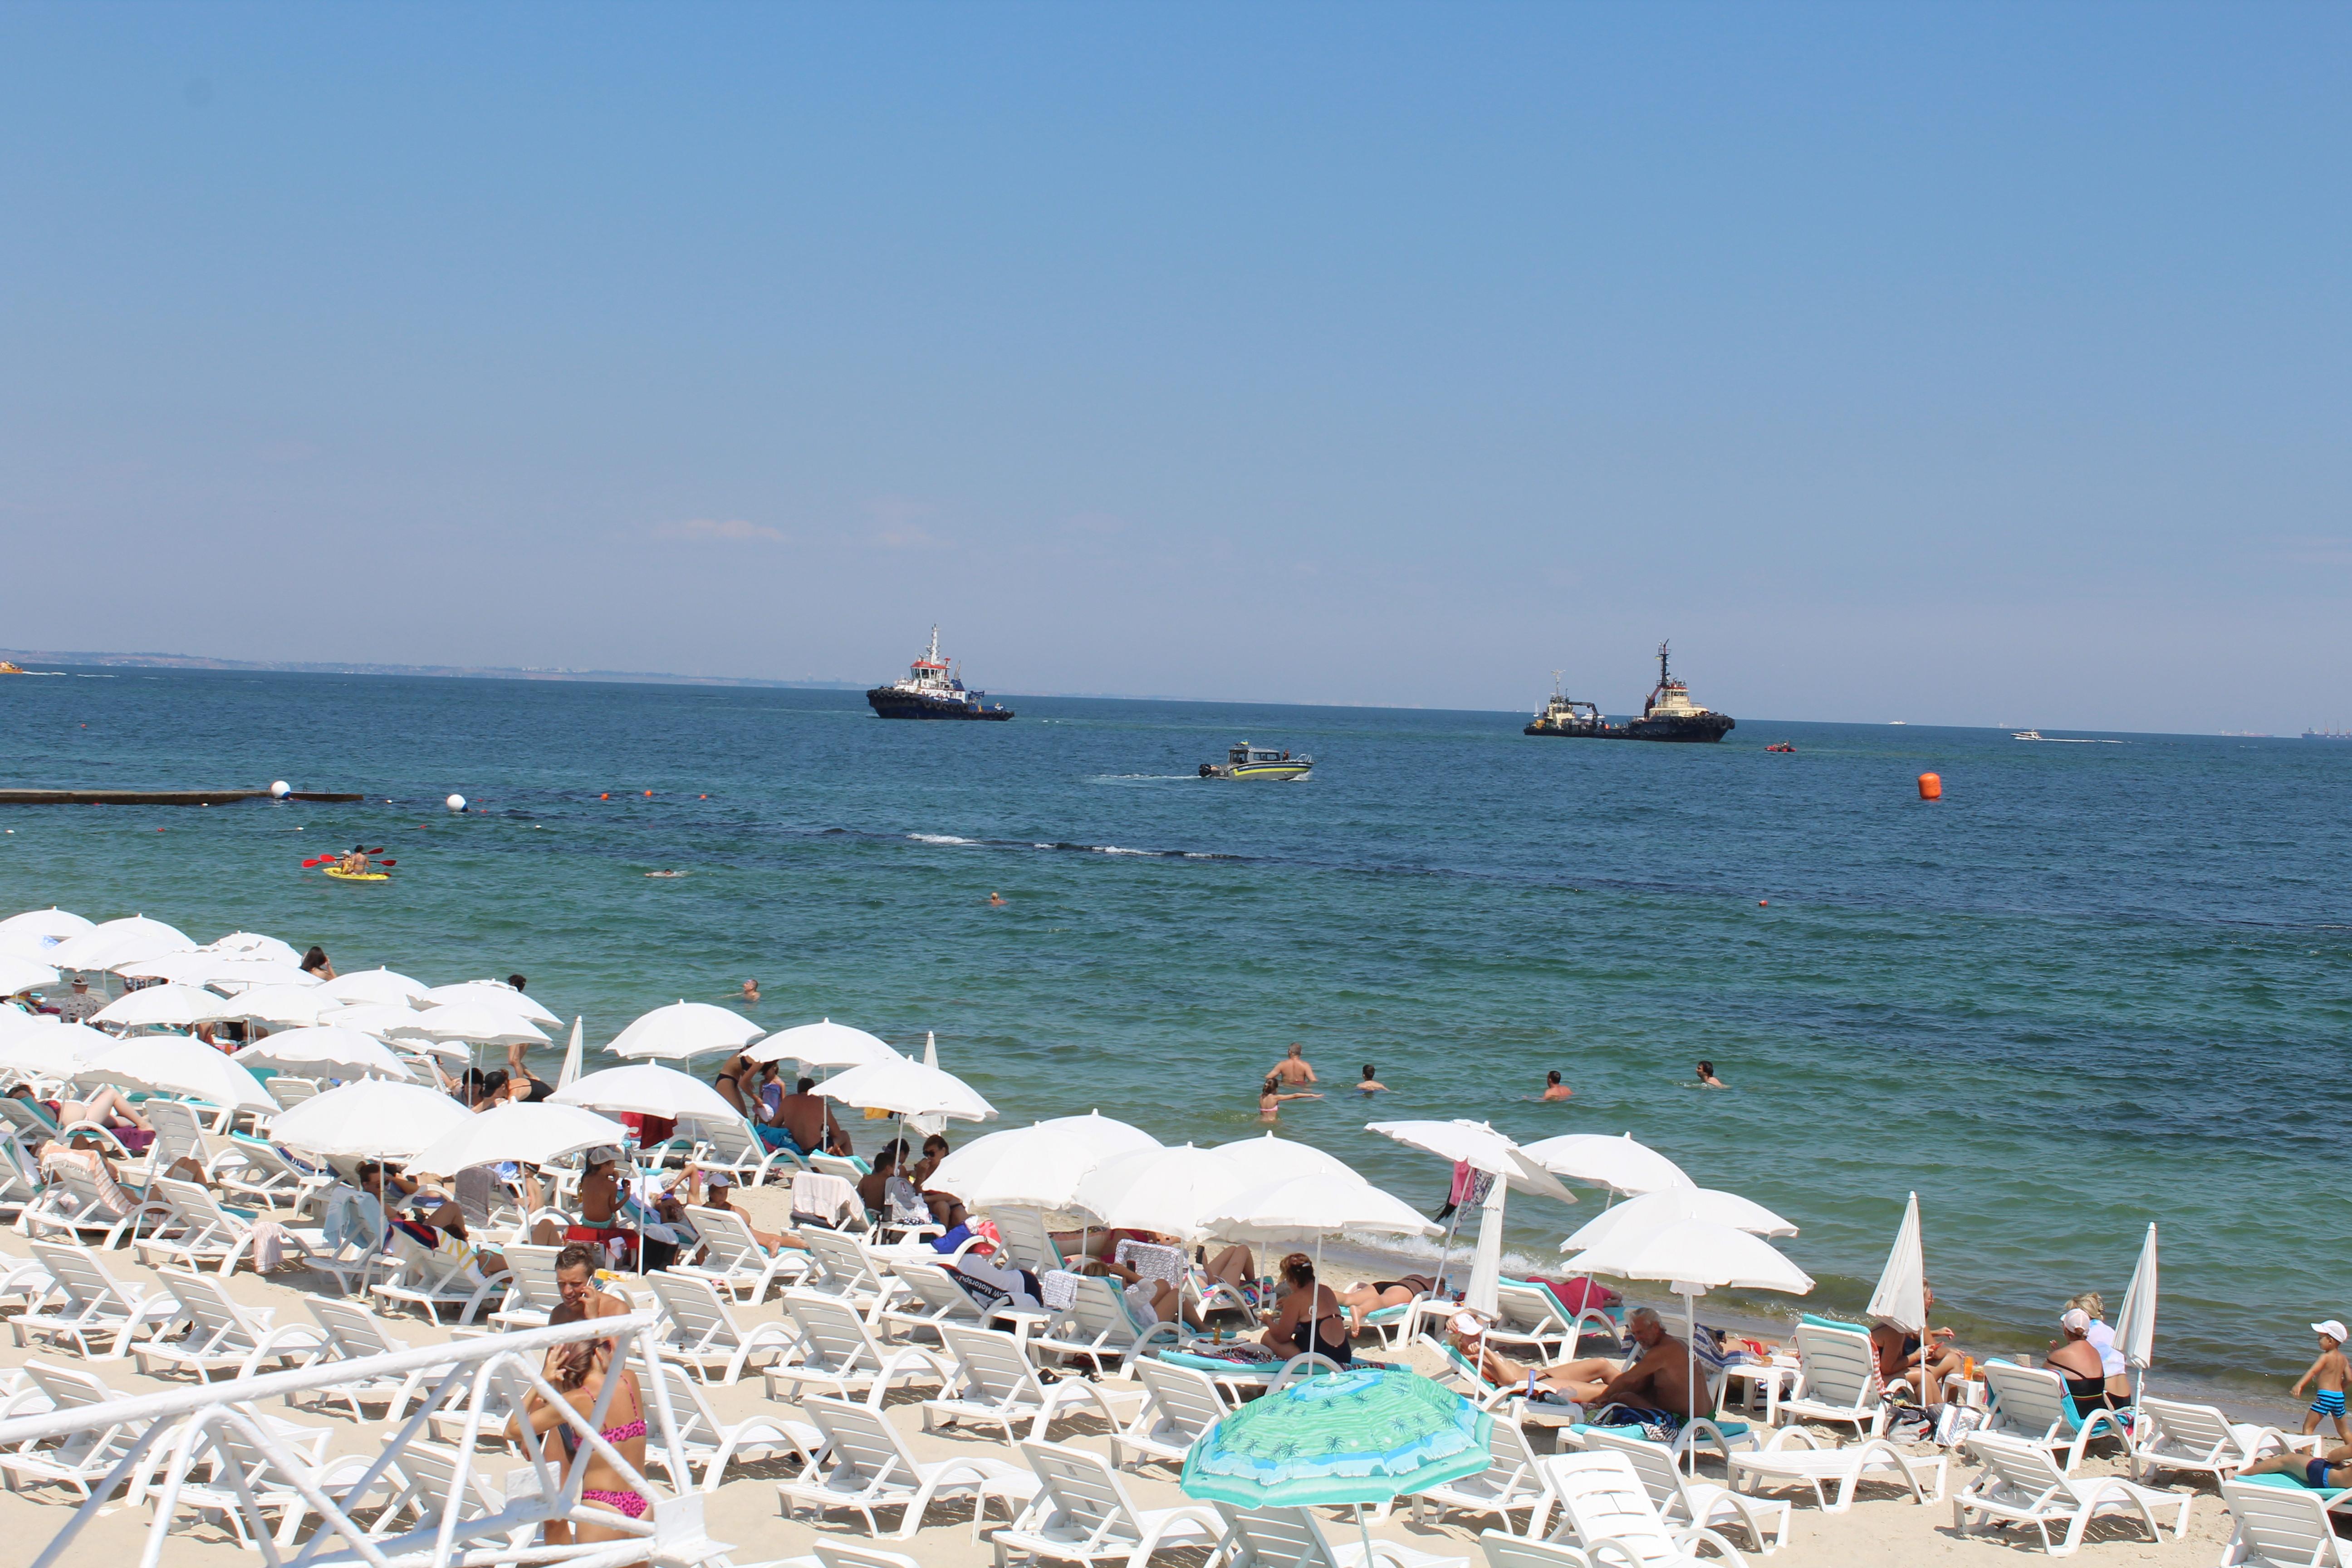 Одесский пляж, лето 2020-го, фото: LIGA.net / Манучарян Диана